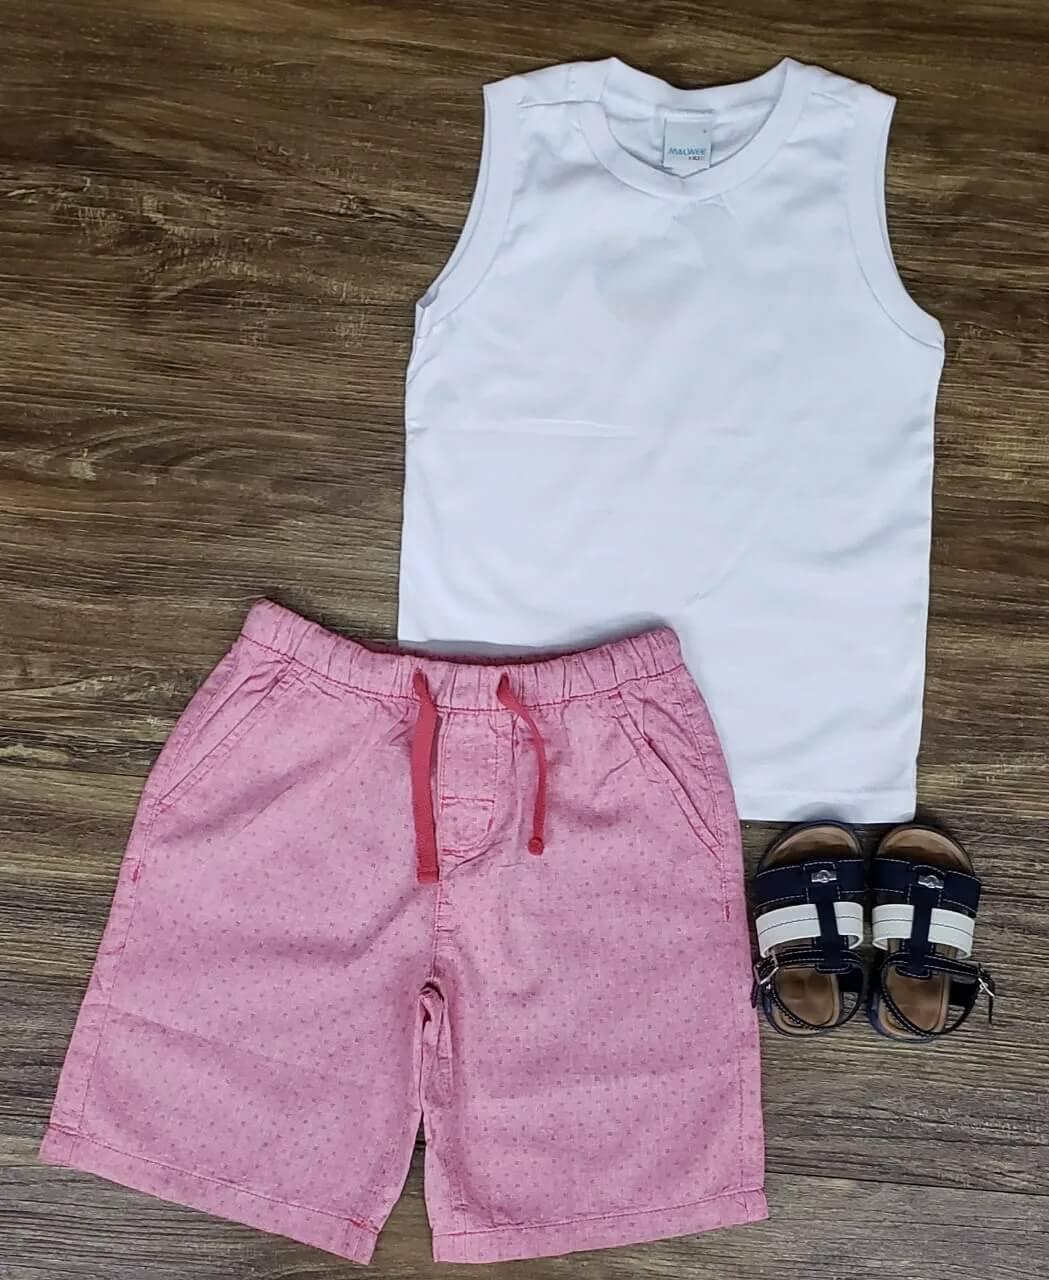 Bermuda Rosa com Regata Branca Infantil